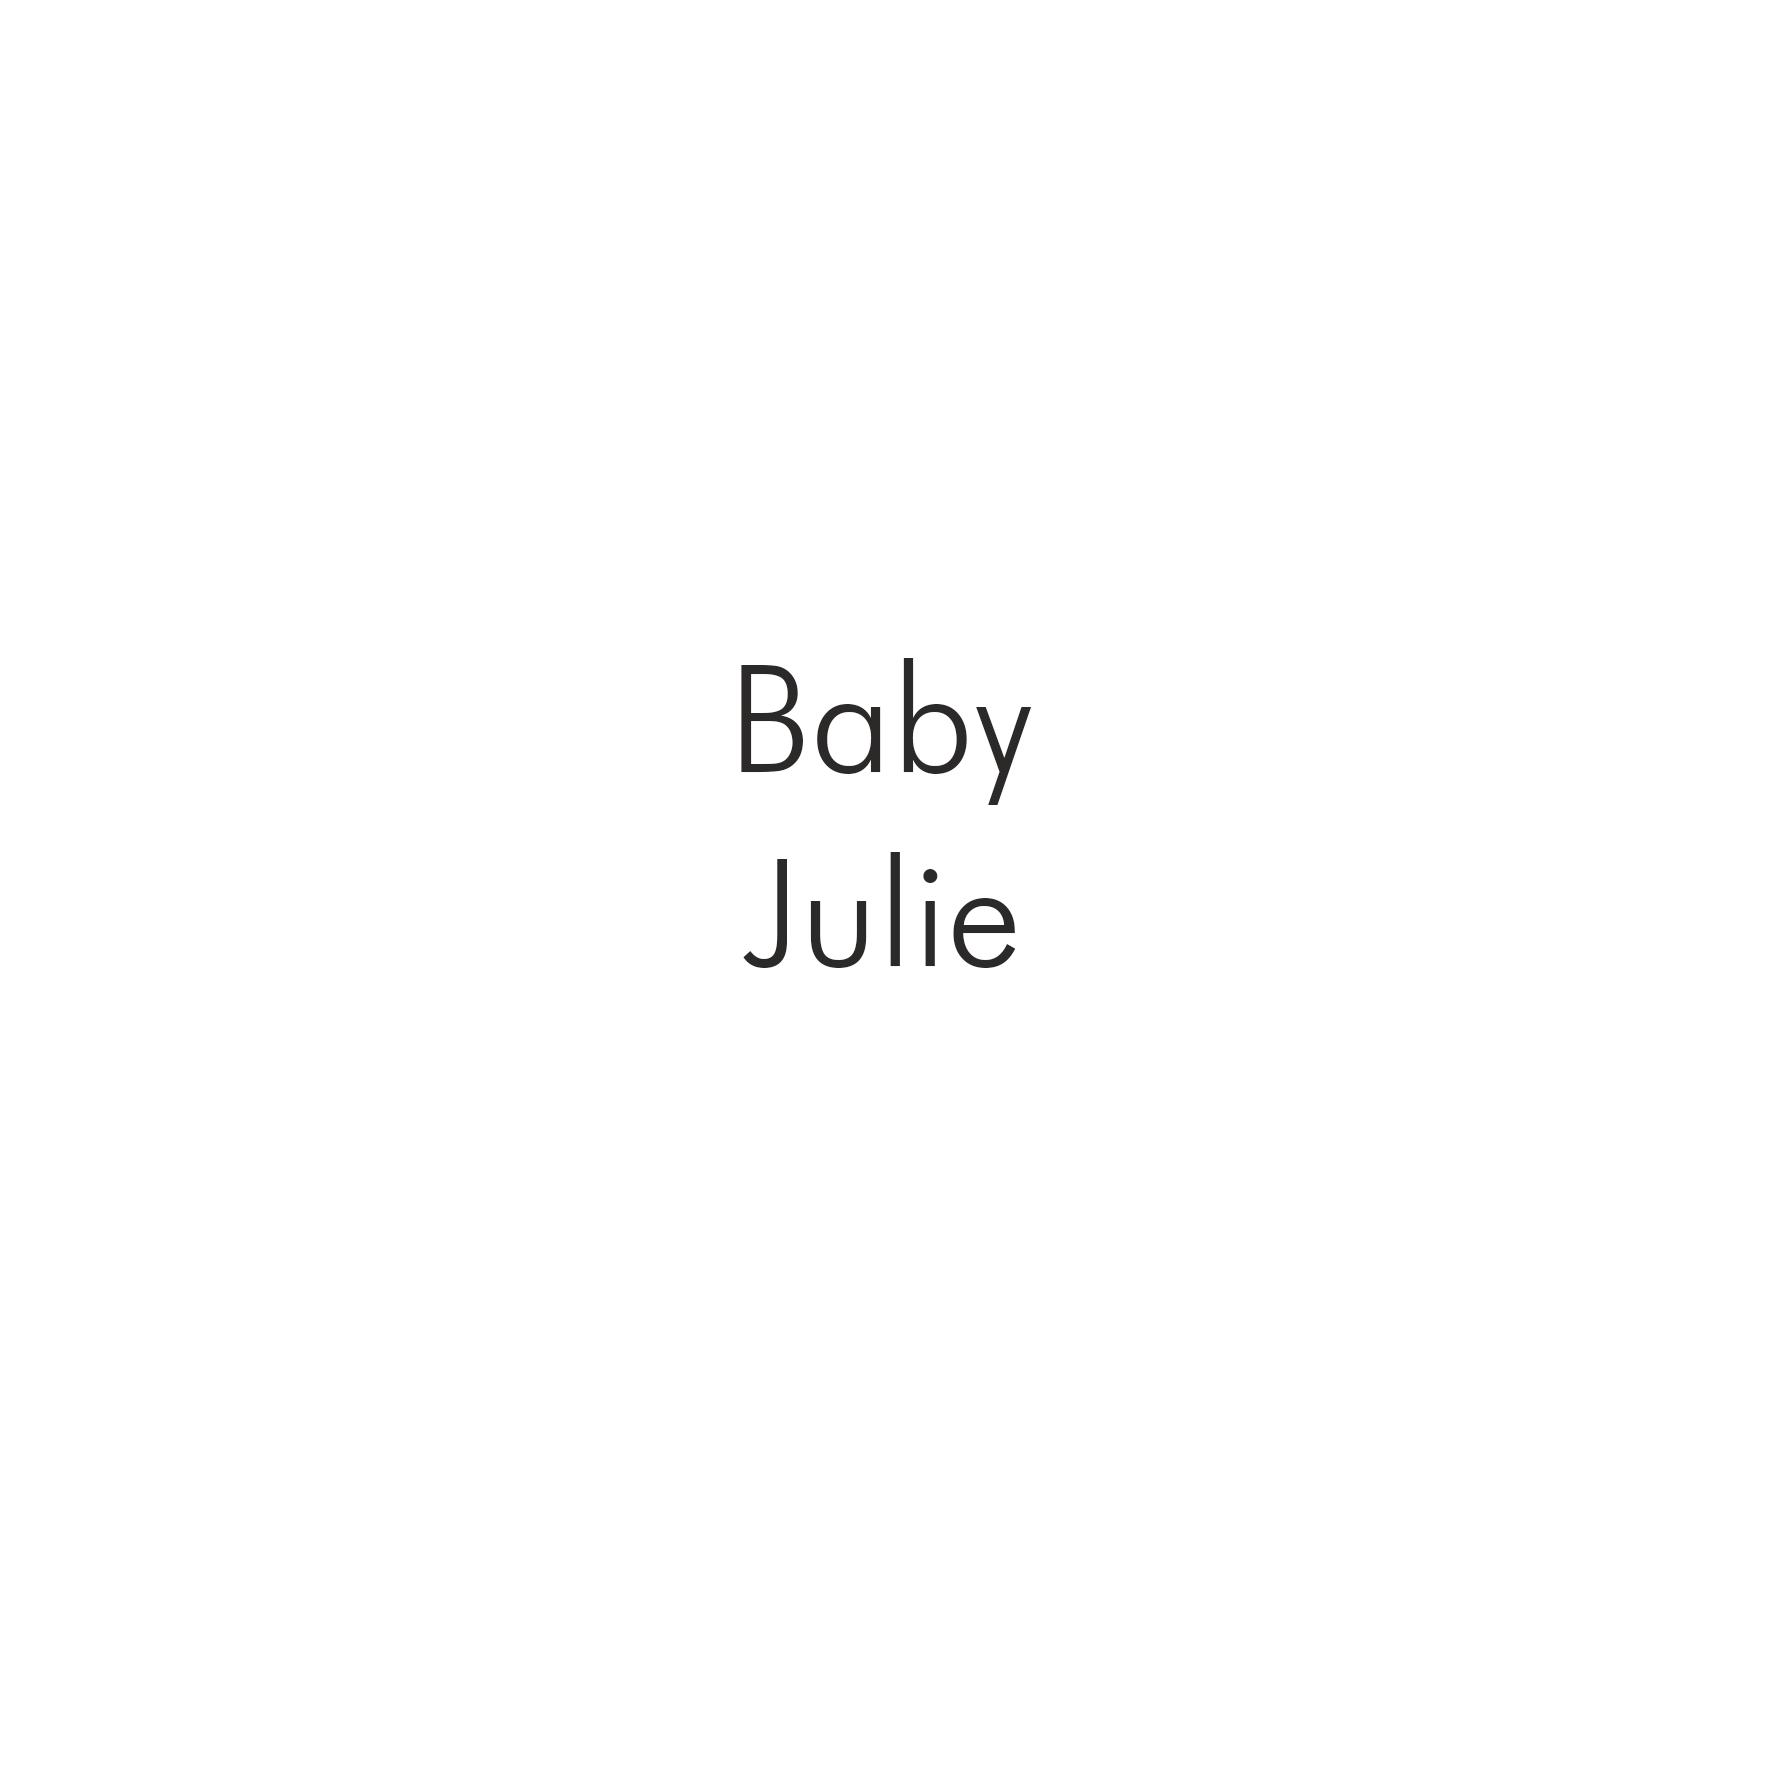 Baby Julie.png